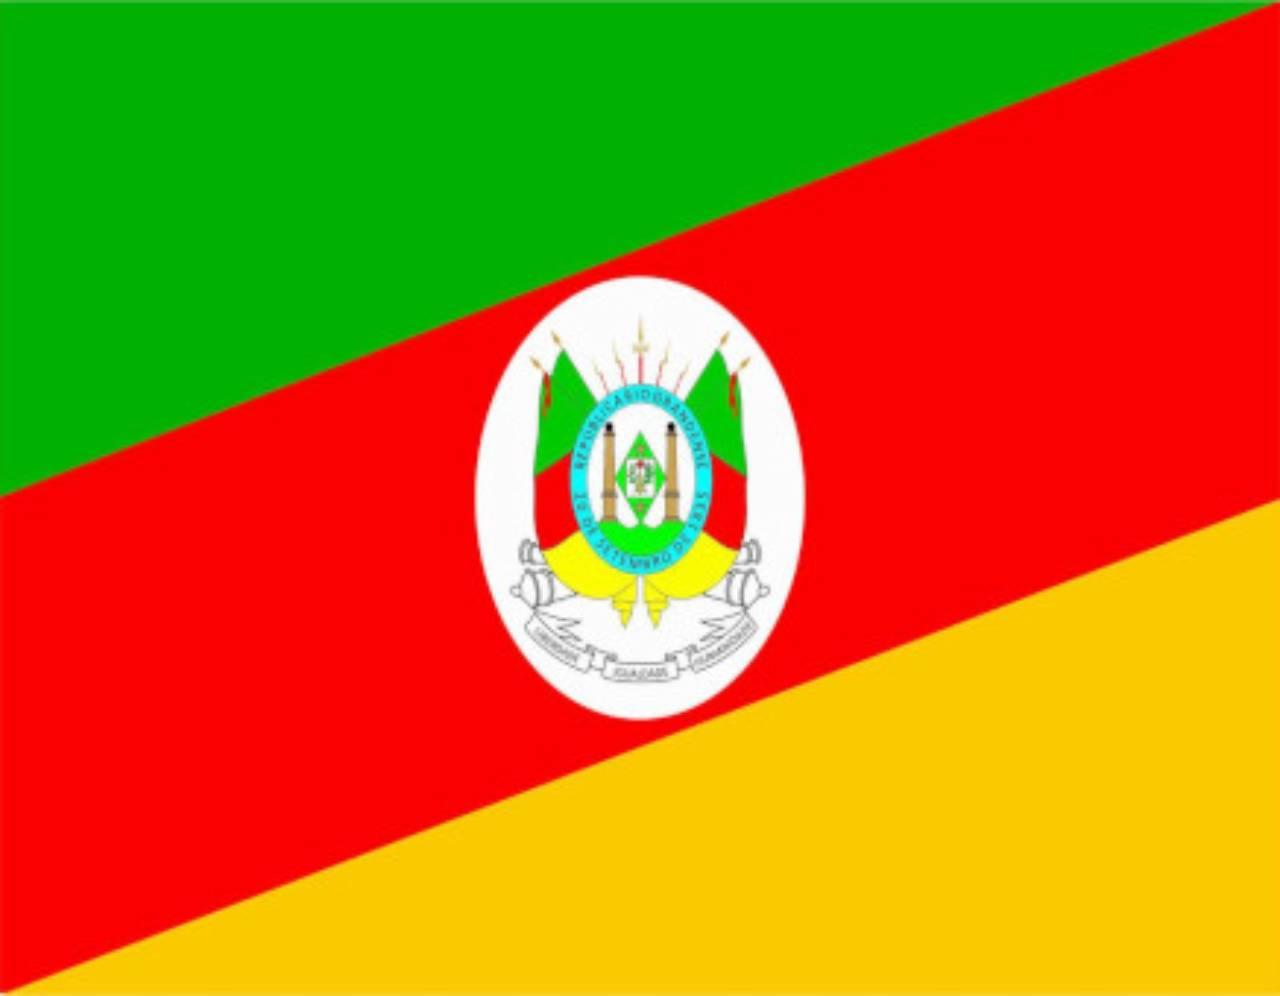 Bandeira do Rio Grande do Sul por Jairo Jaime Bandeiras e Flâmulas